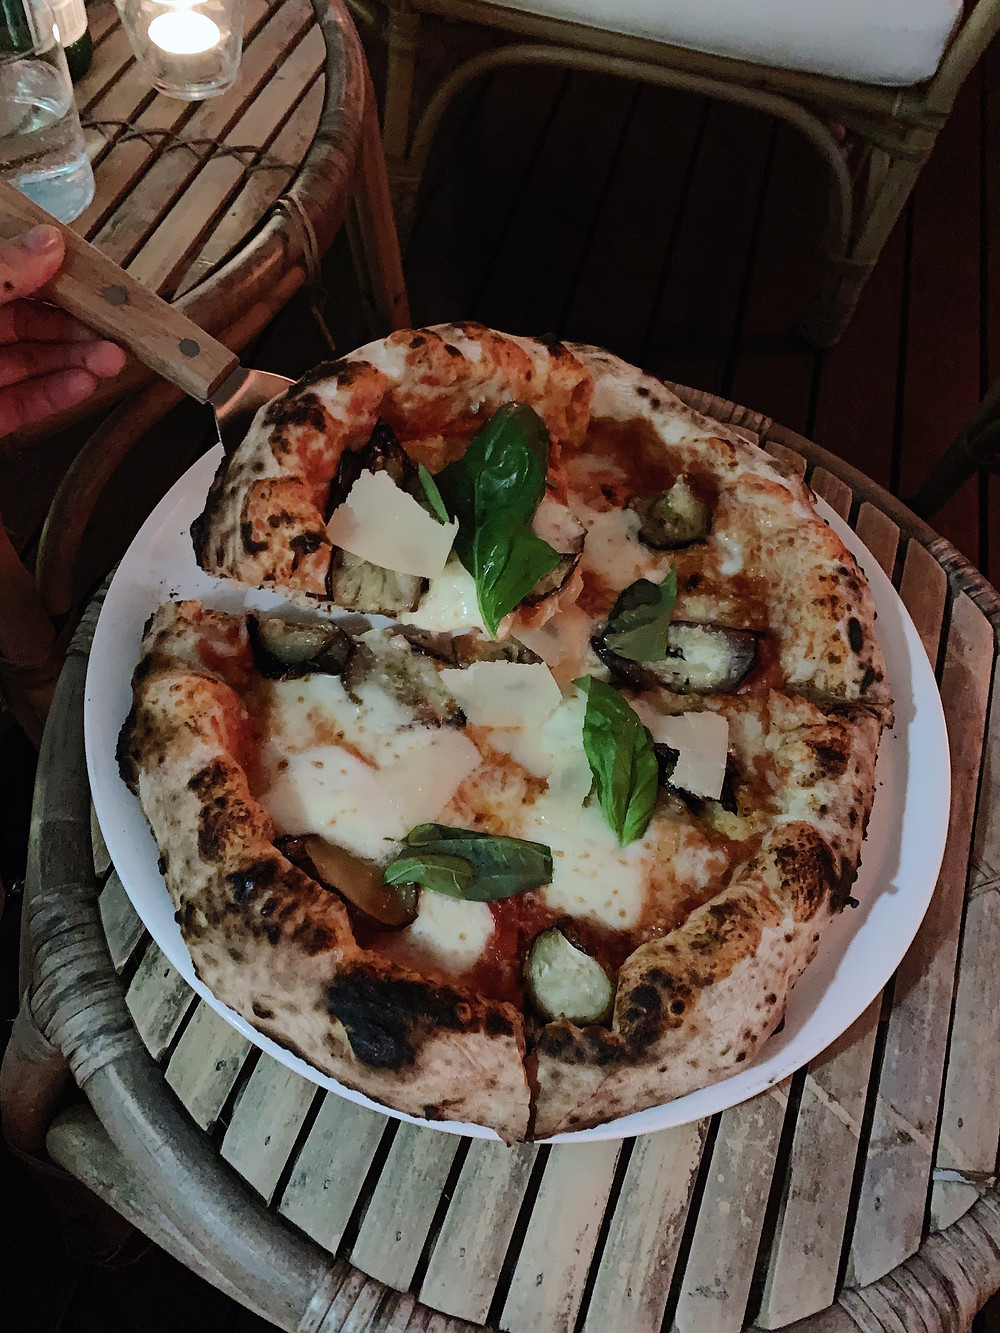 Kytaly pizza restaurant in Hong Kong